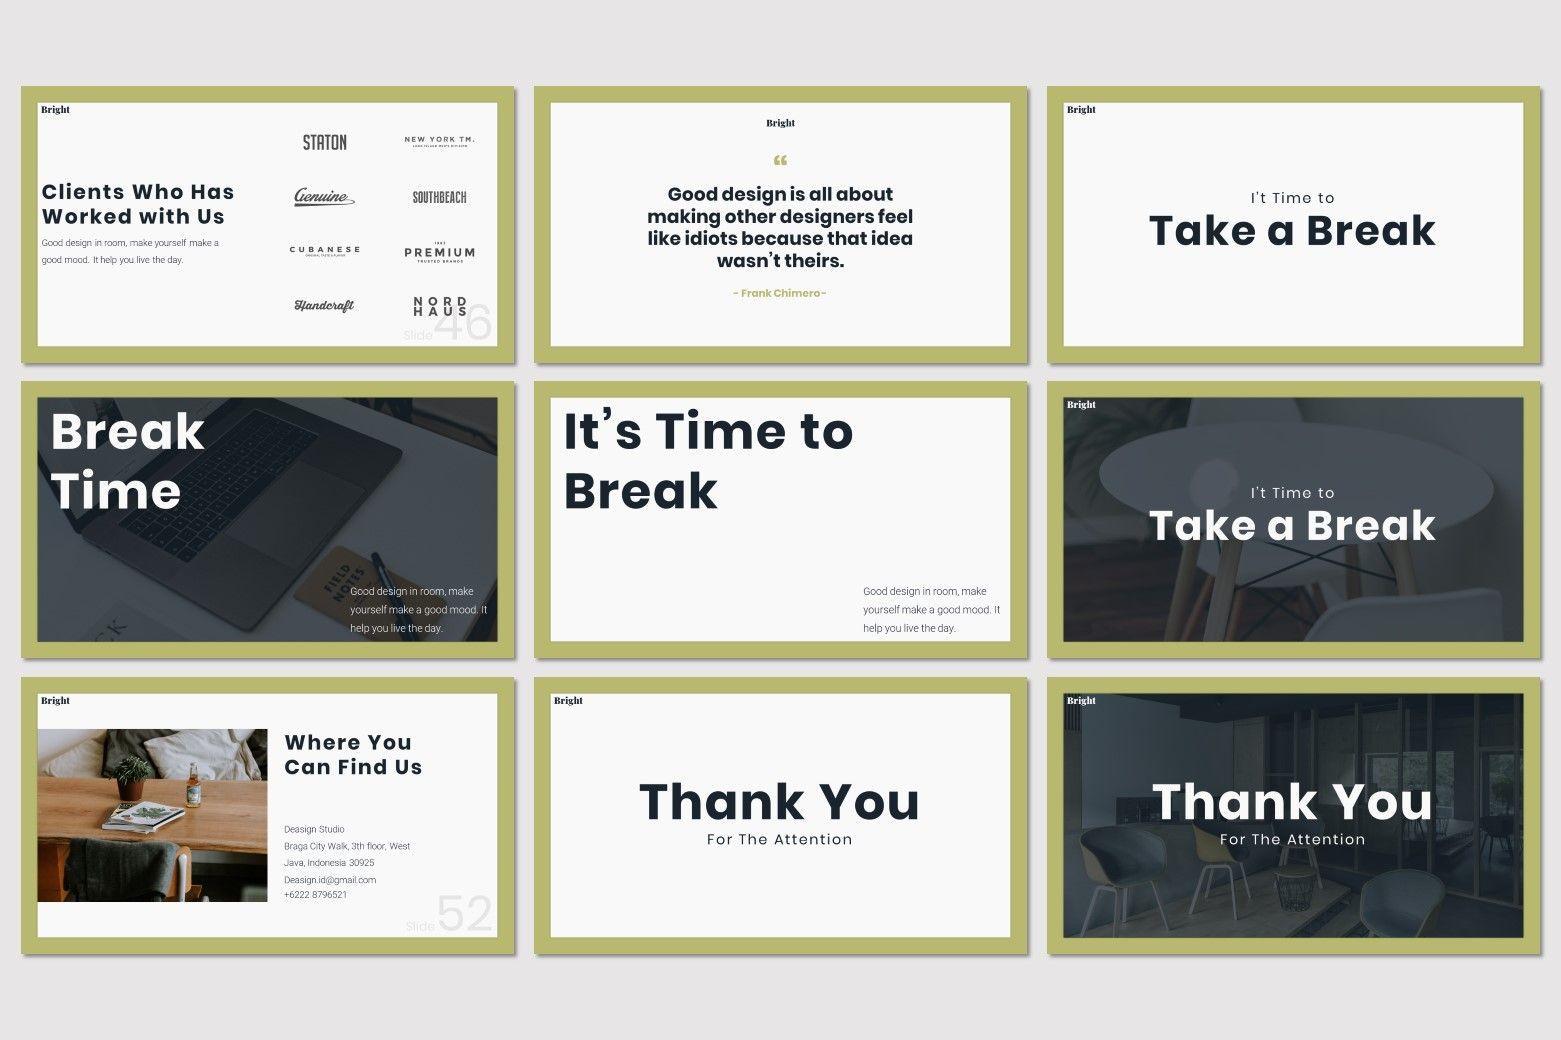 Bright - Powerpoint Template, Slide 8, 07577, Presentation Templates — PoweredTemplate.com